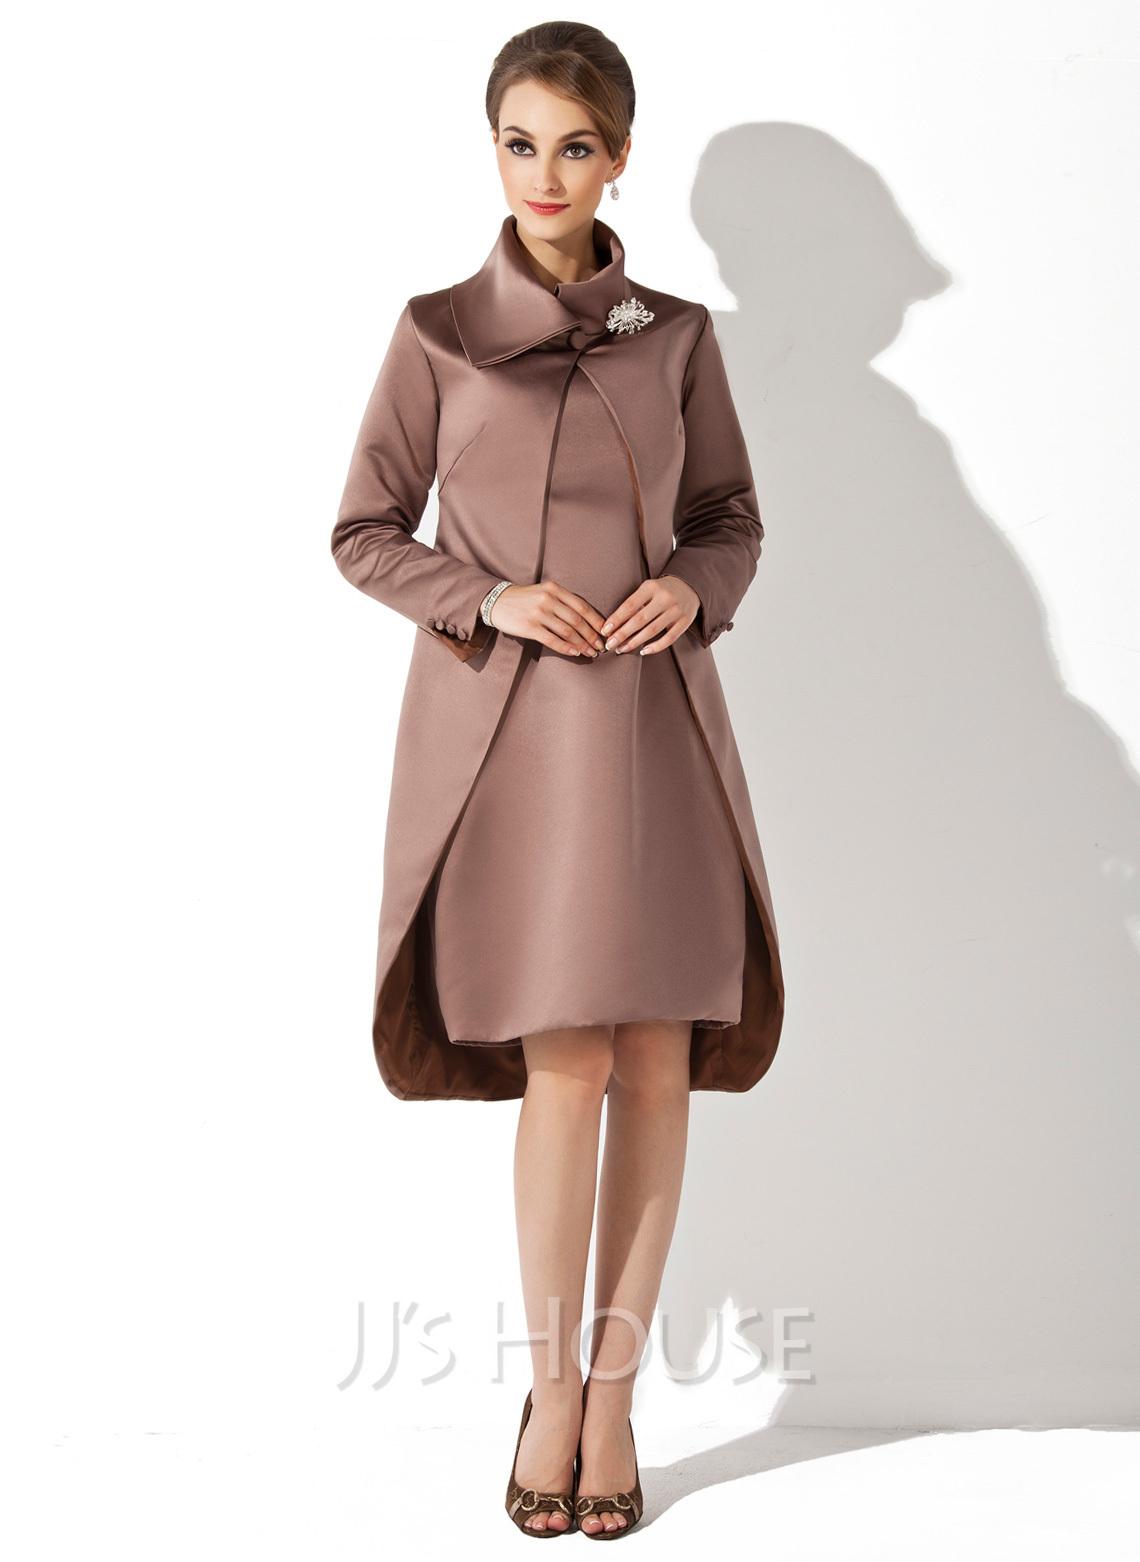 Sheath/Column Scoop Neck Knee-Length Satin Mother of the Bride Dress